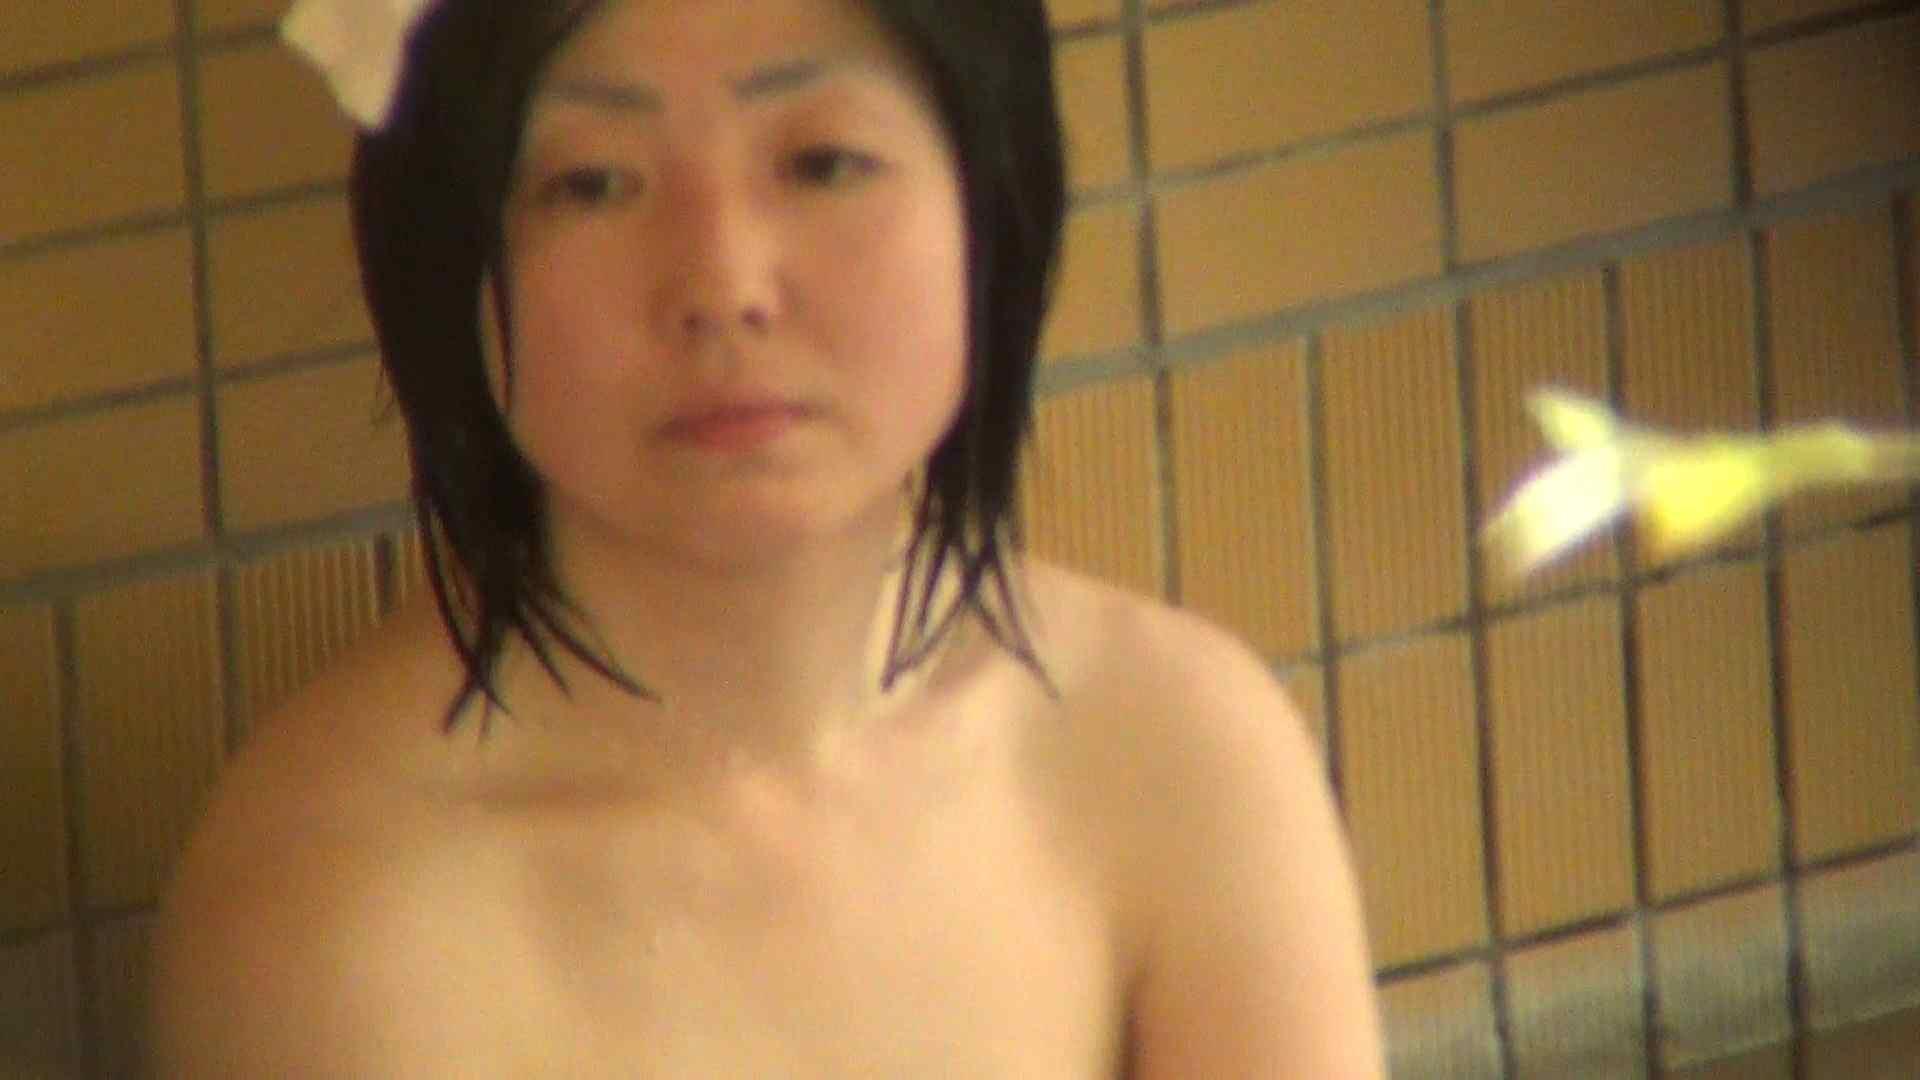 Aquaな露天風呂Vol.313 HなOL | 盗撮  66pic 66